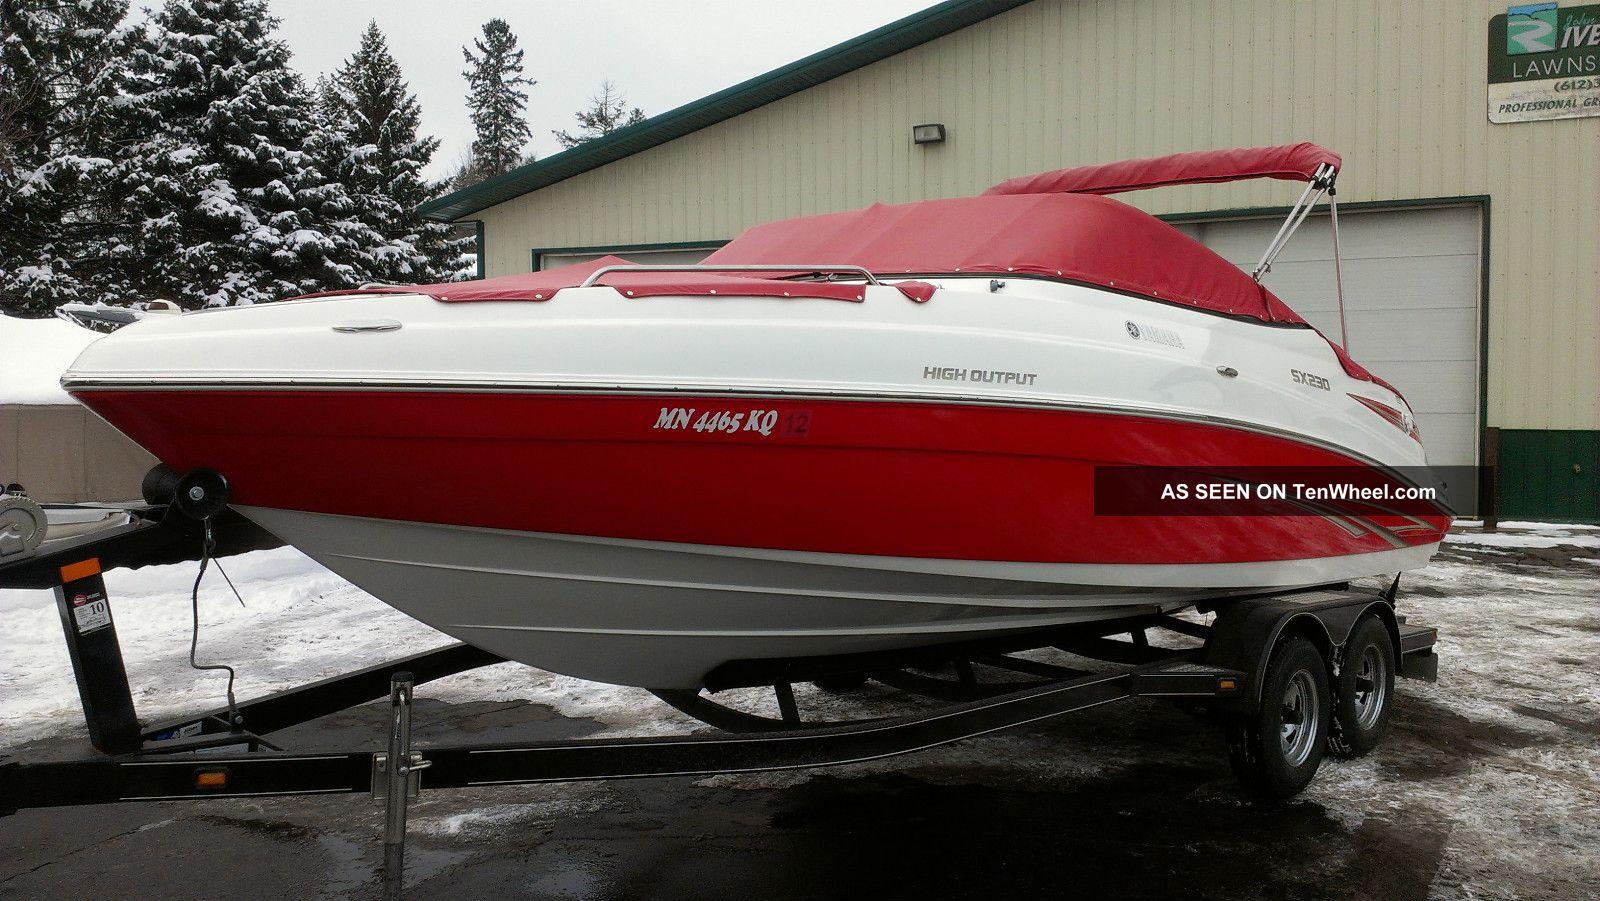 2009 Yamaha Sx230 High Output Jet Boats photo